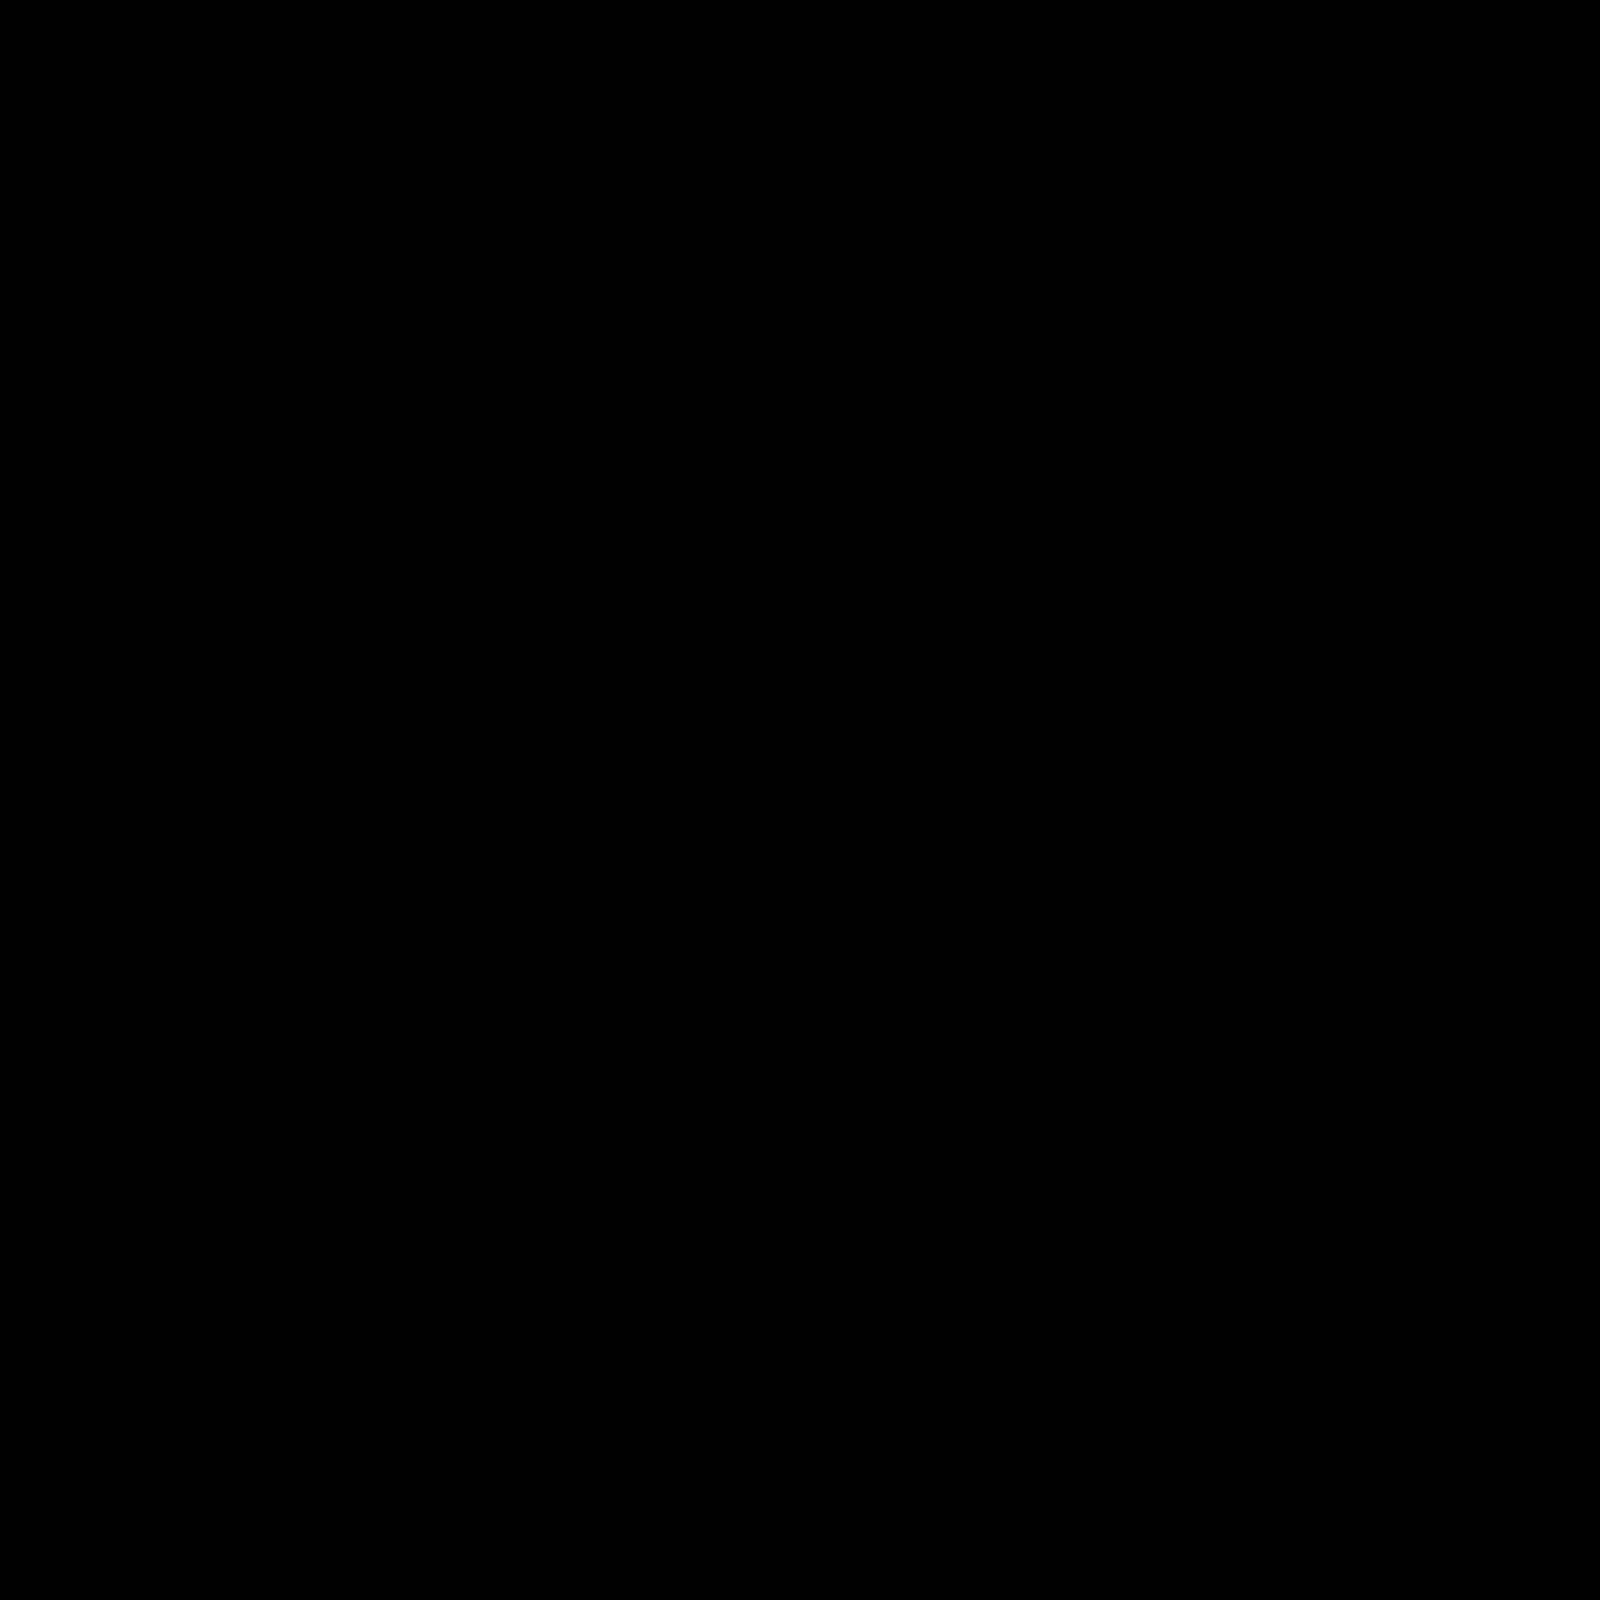 Plaża icon